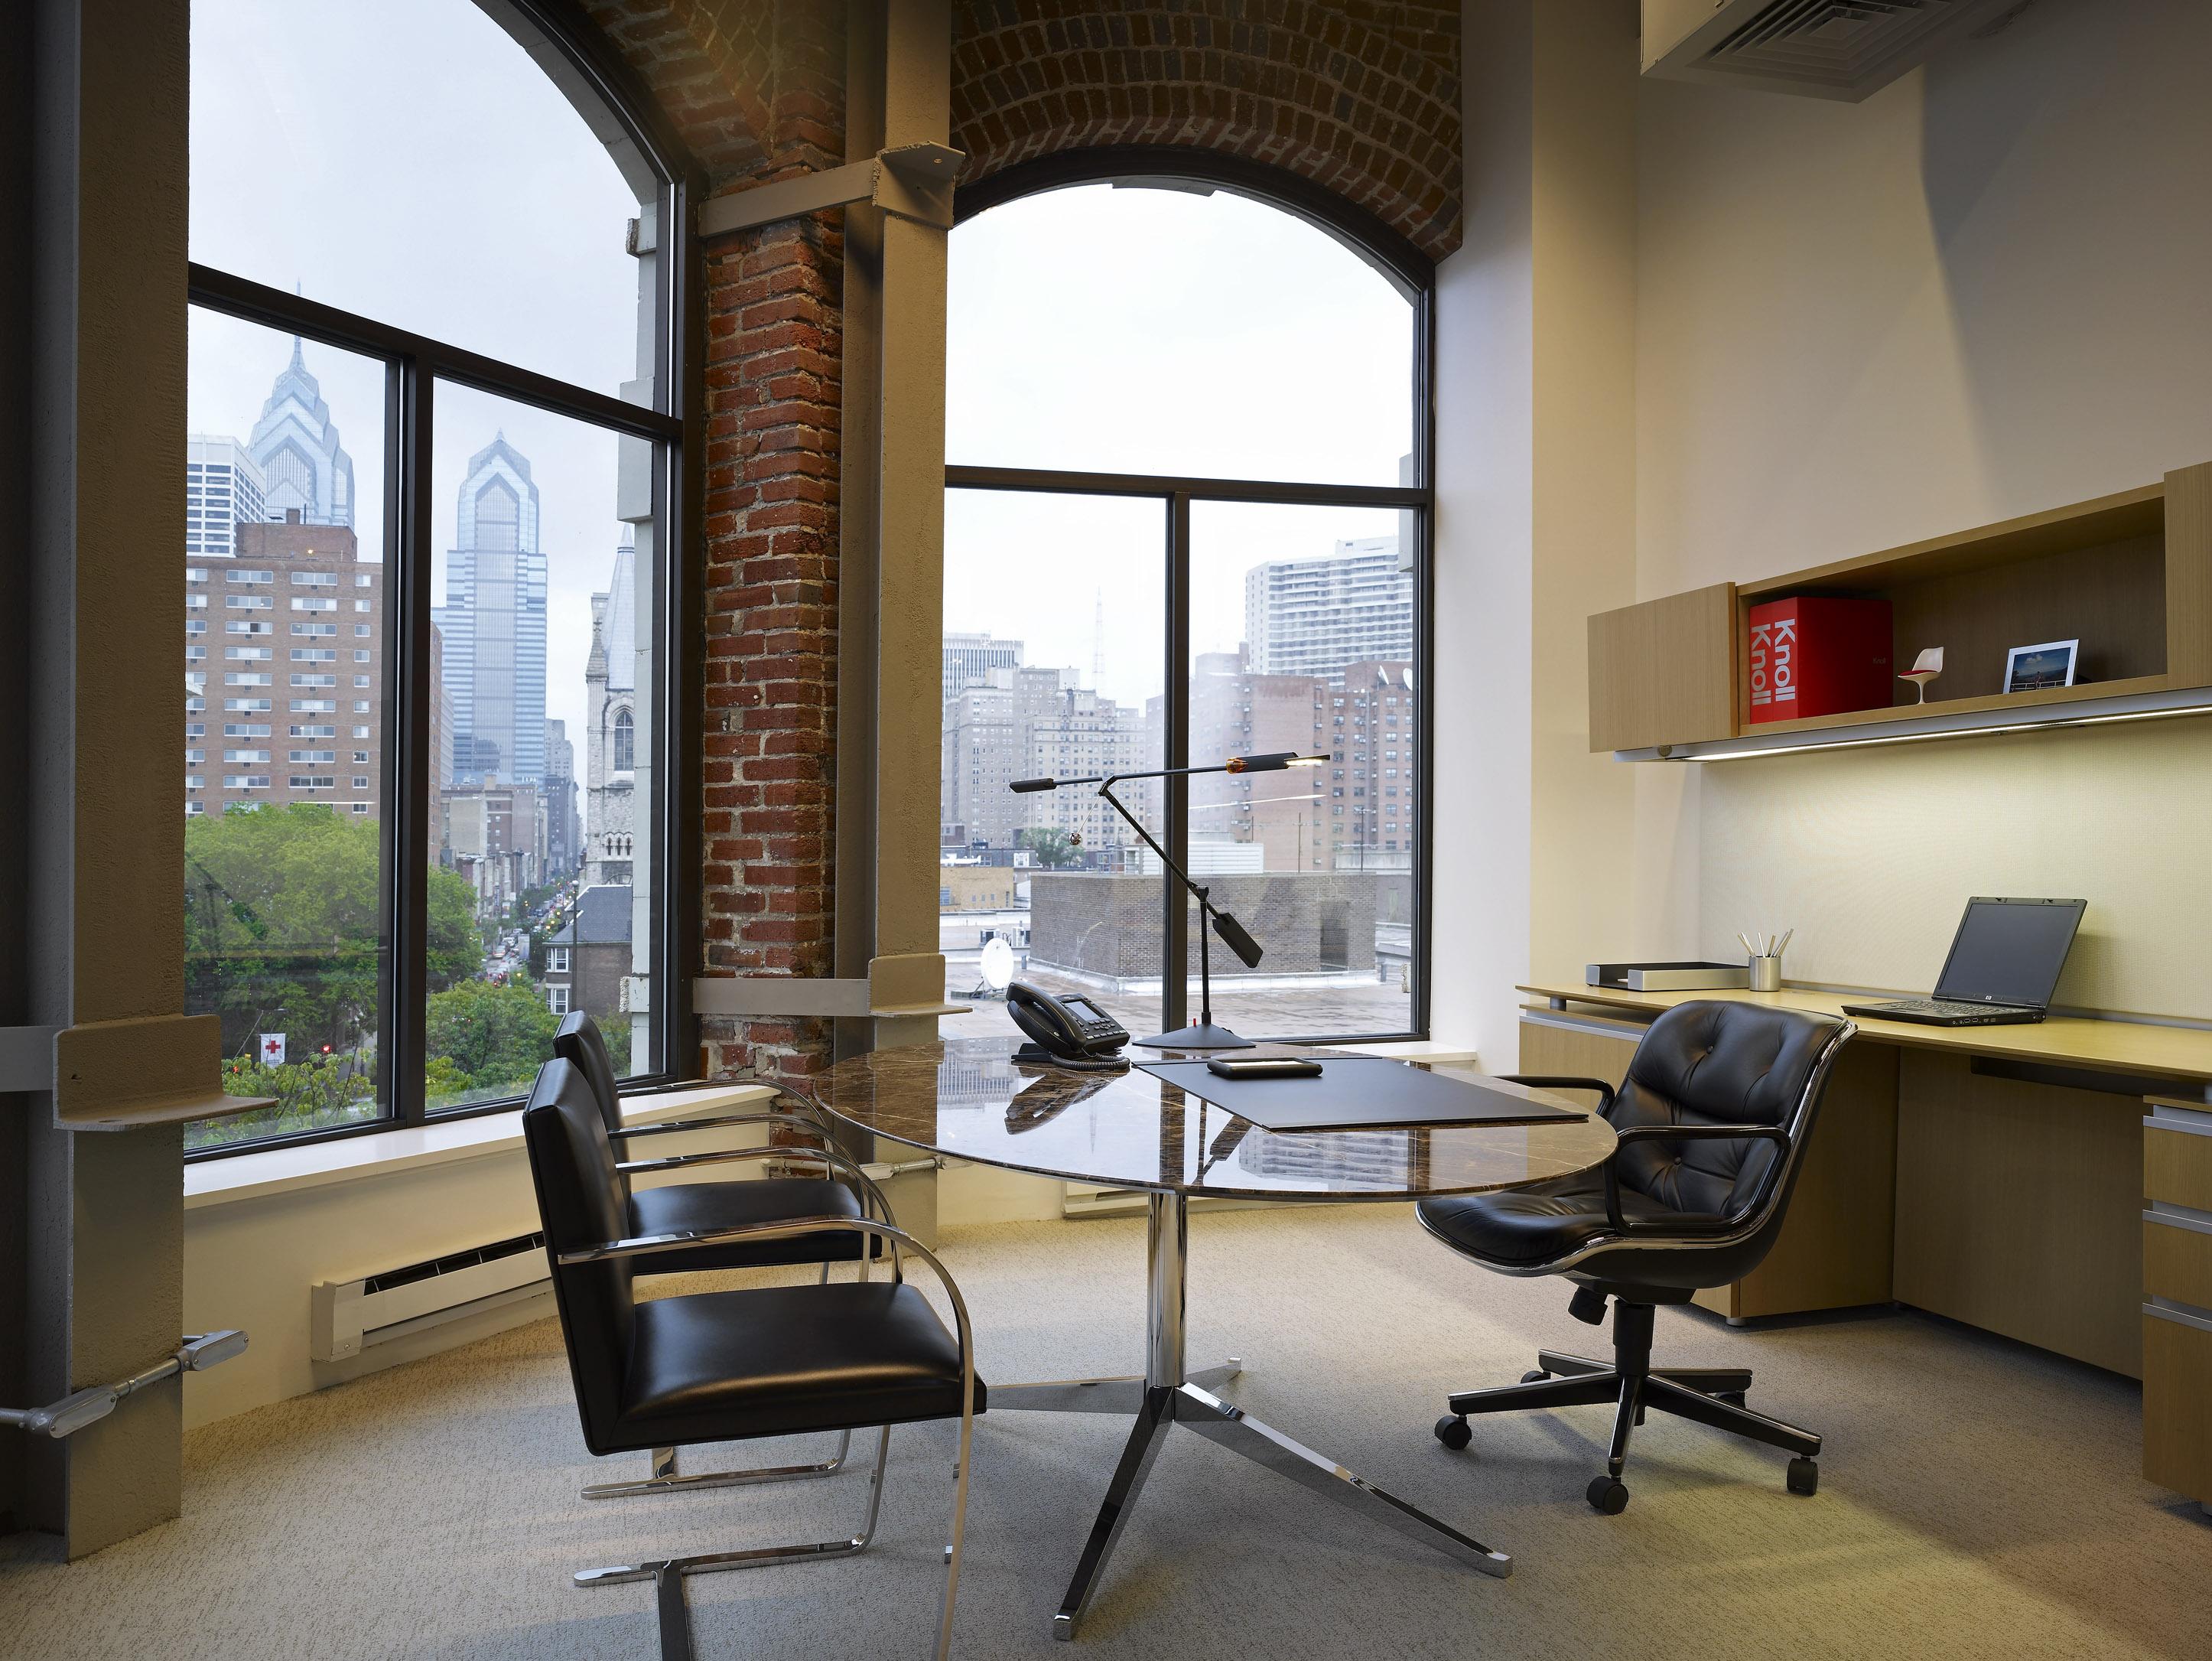 pollock executive chair knoll. Black Bedroom Furniture Sets. Home Design Ideas